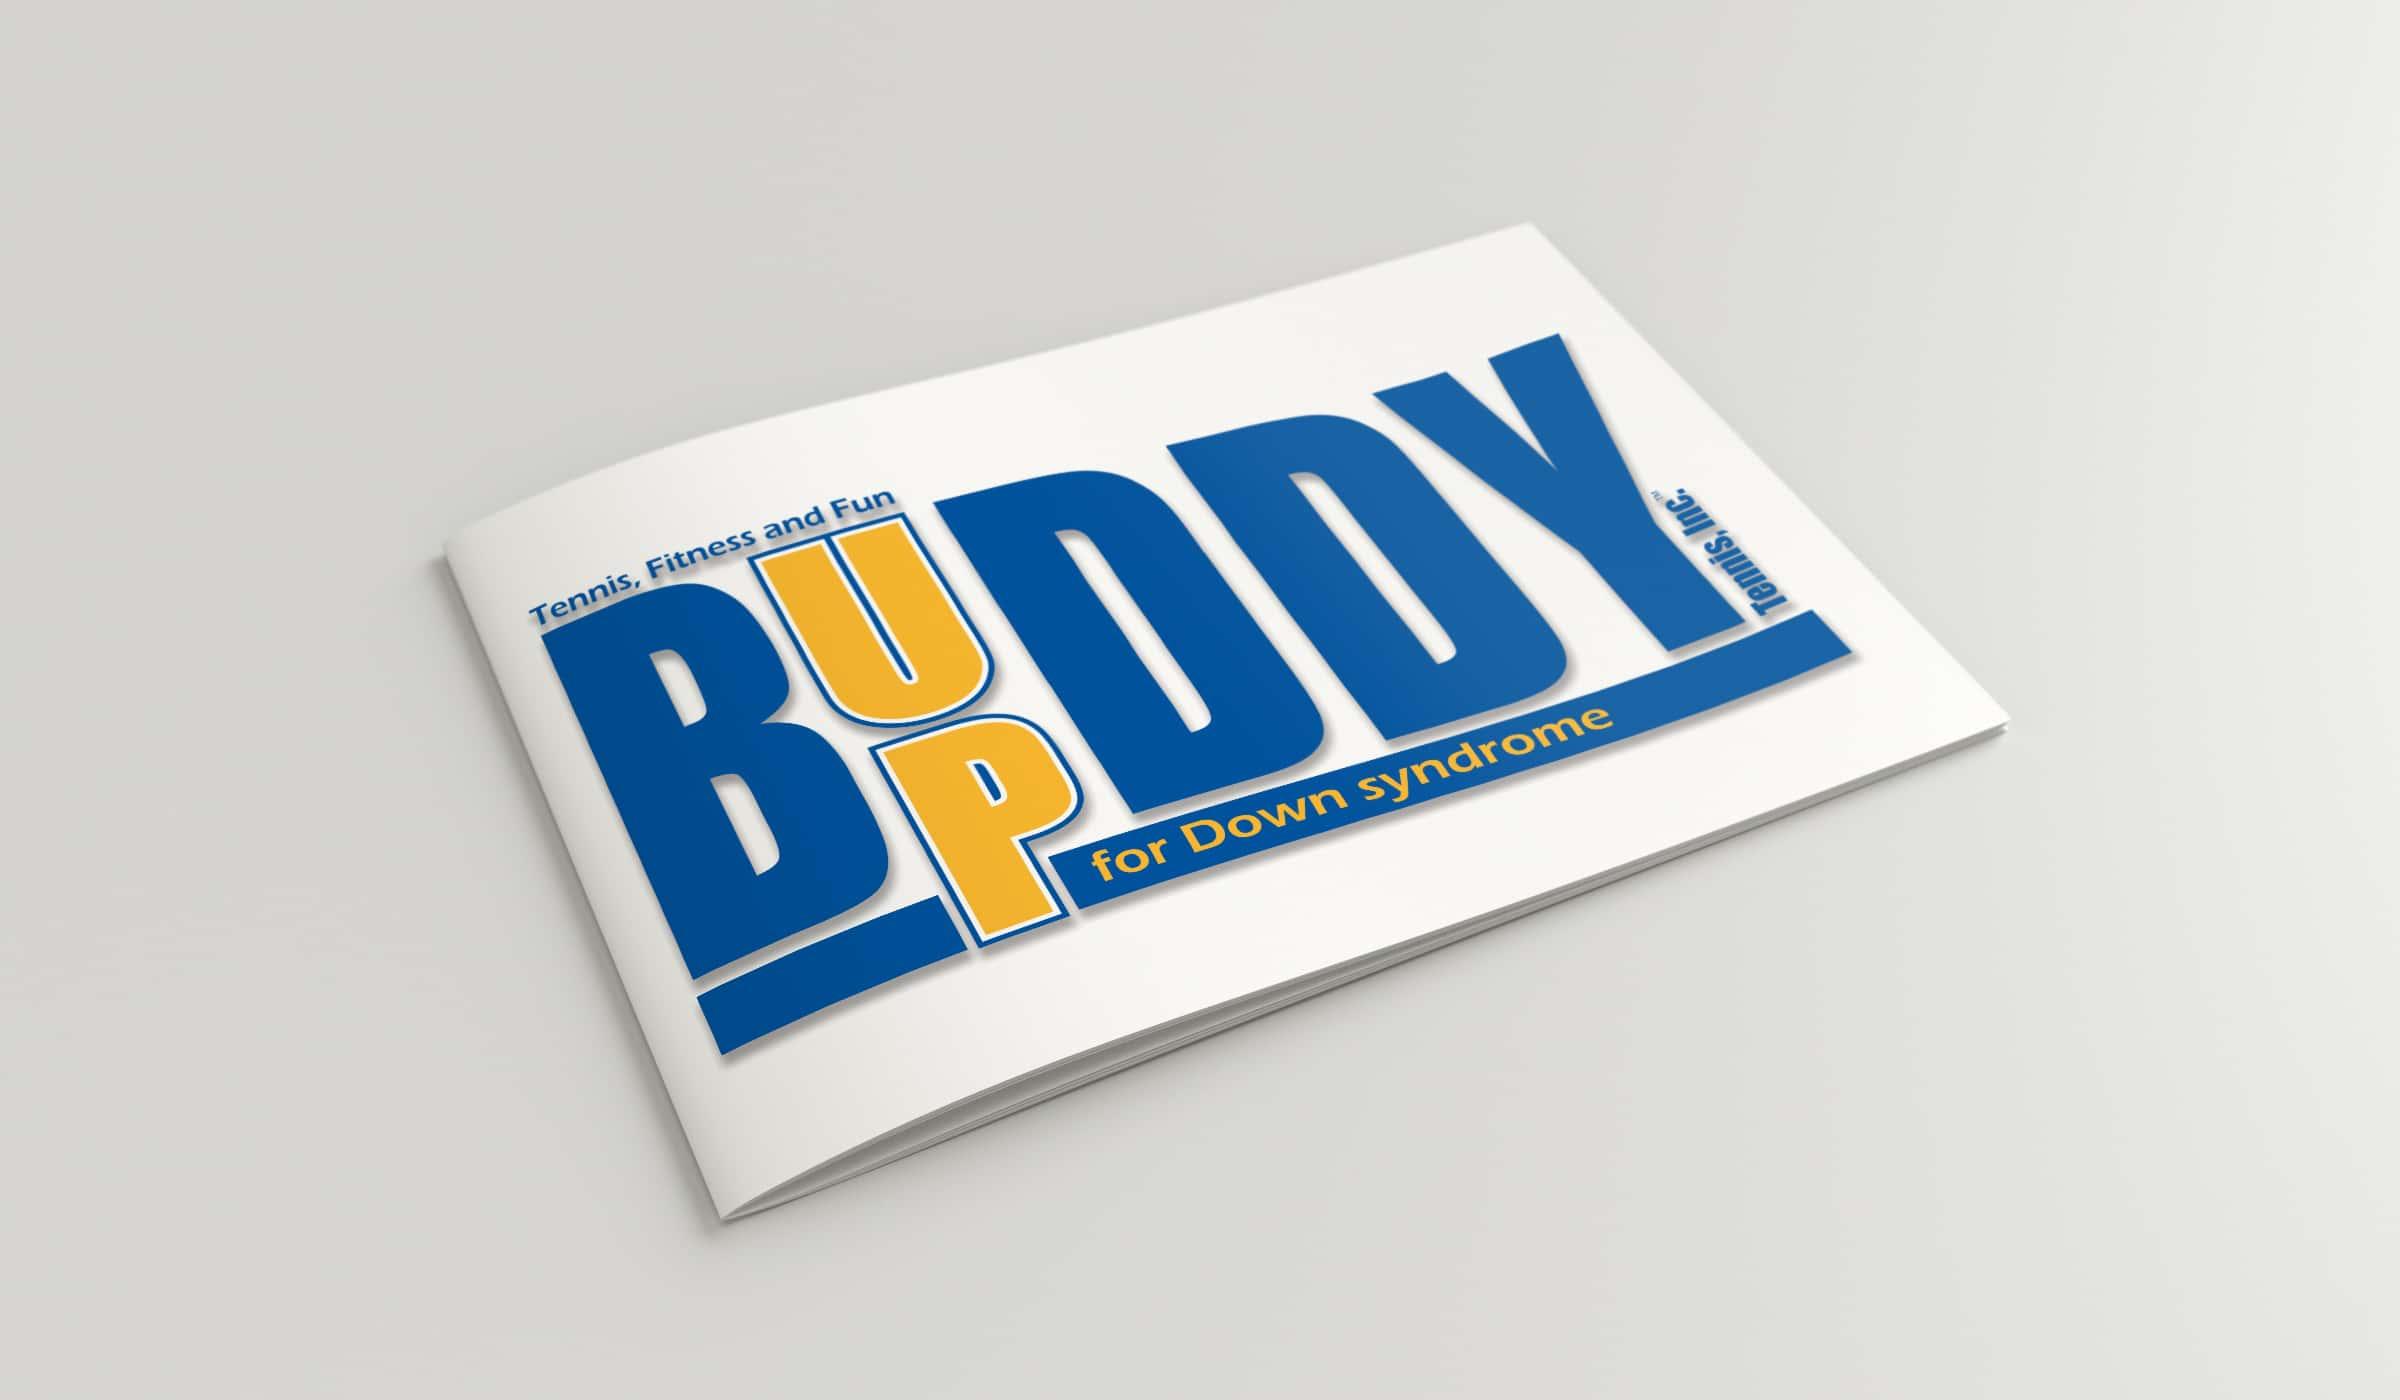 Buddy+Up+Tennis+booklet.jpg